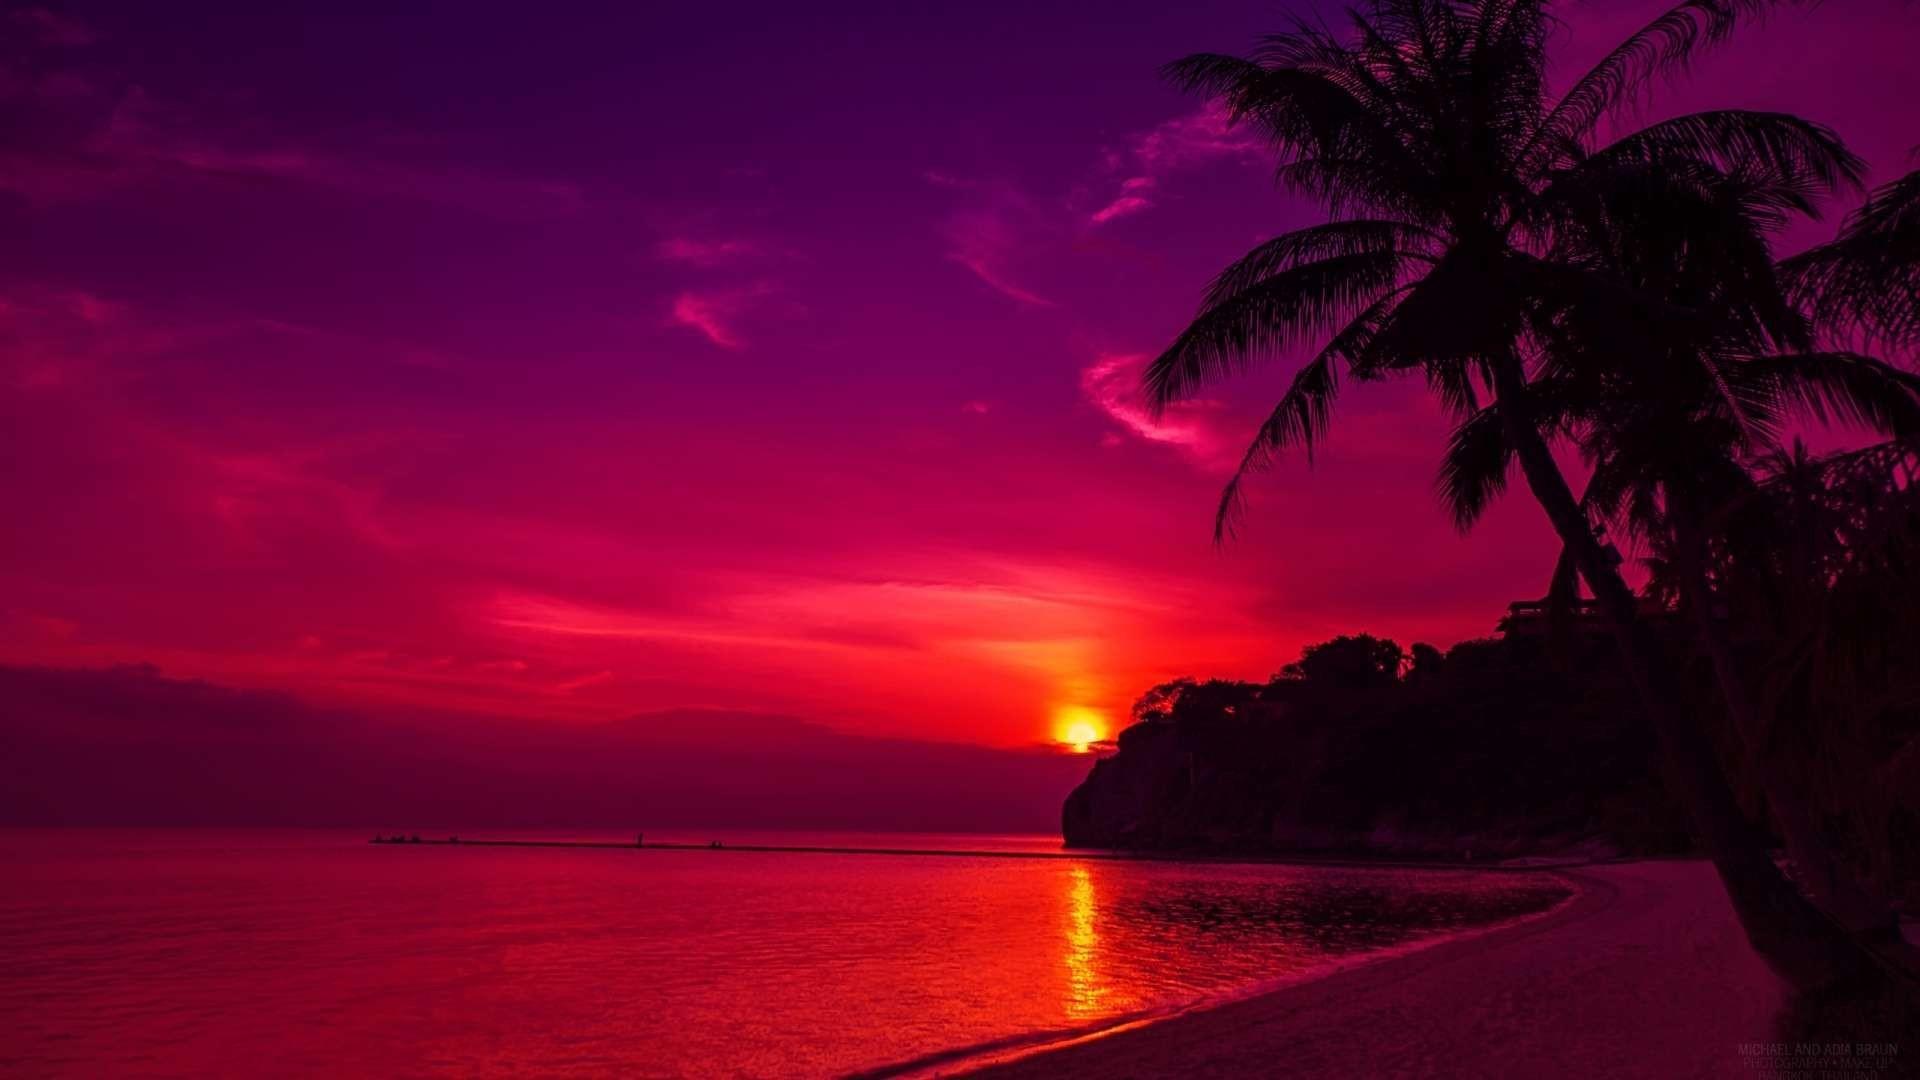 Beach Sunset Wallpaper Picture